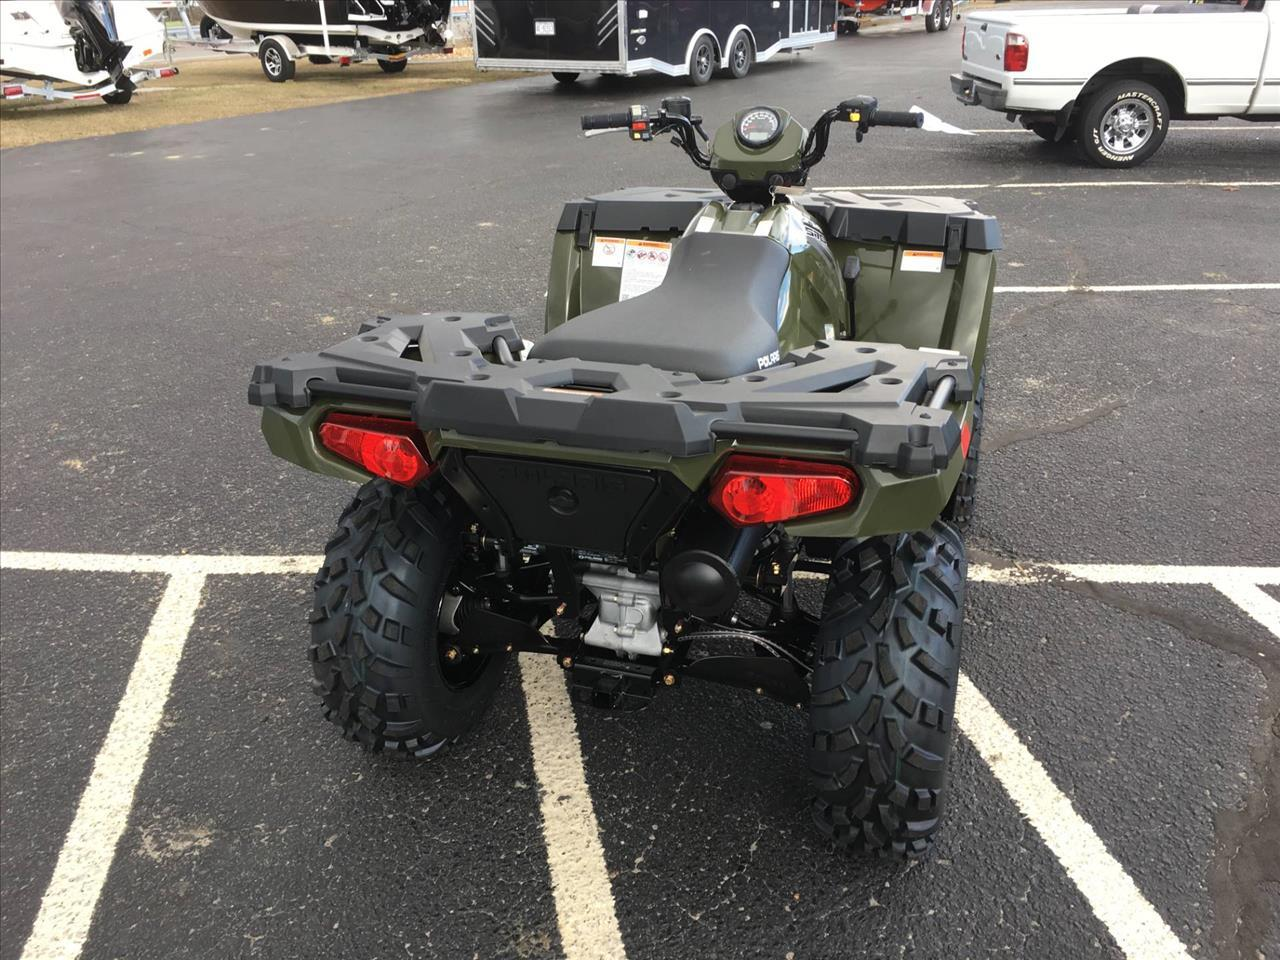 2017 Polaris Sportsman 570 for sale at Vehicle Network, LLC - Performance East, INC. in Goldsboro NC